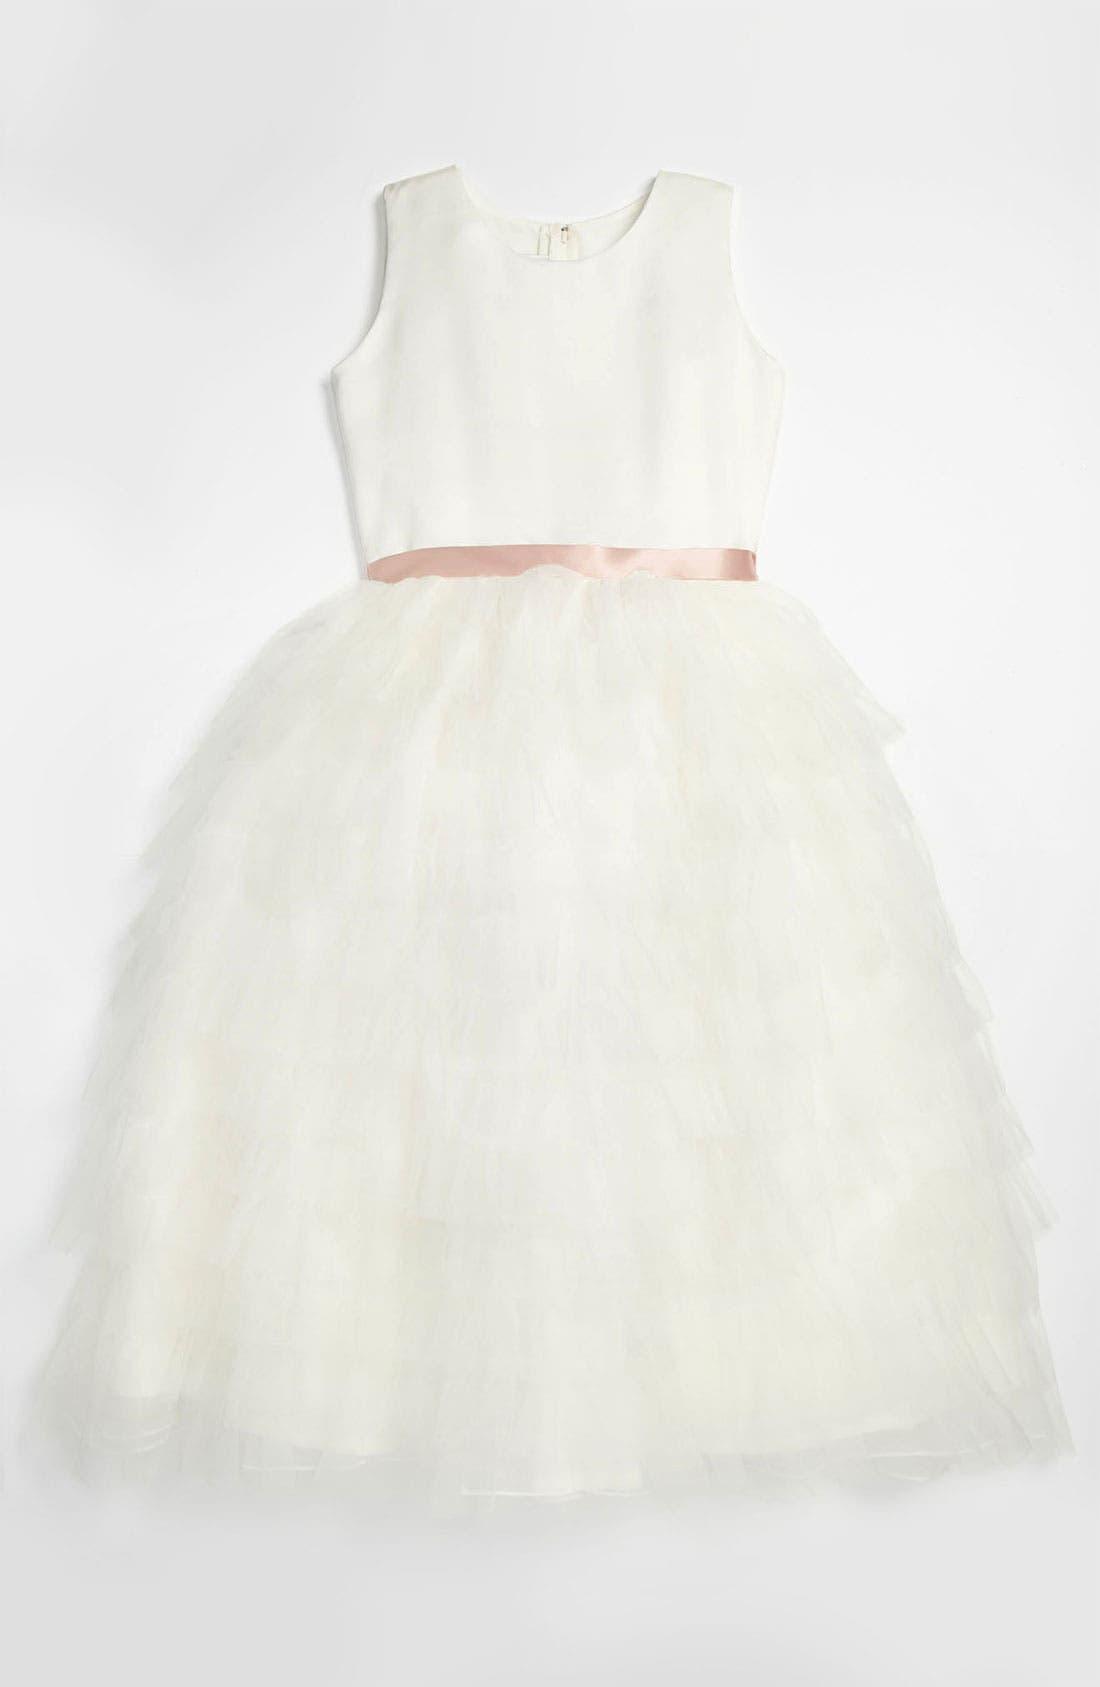 Alternate Image 1 Selected - Joan Calabrese for Mon Cheri 'Cupcake' Dress (Little Girls & Big Girls)